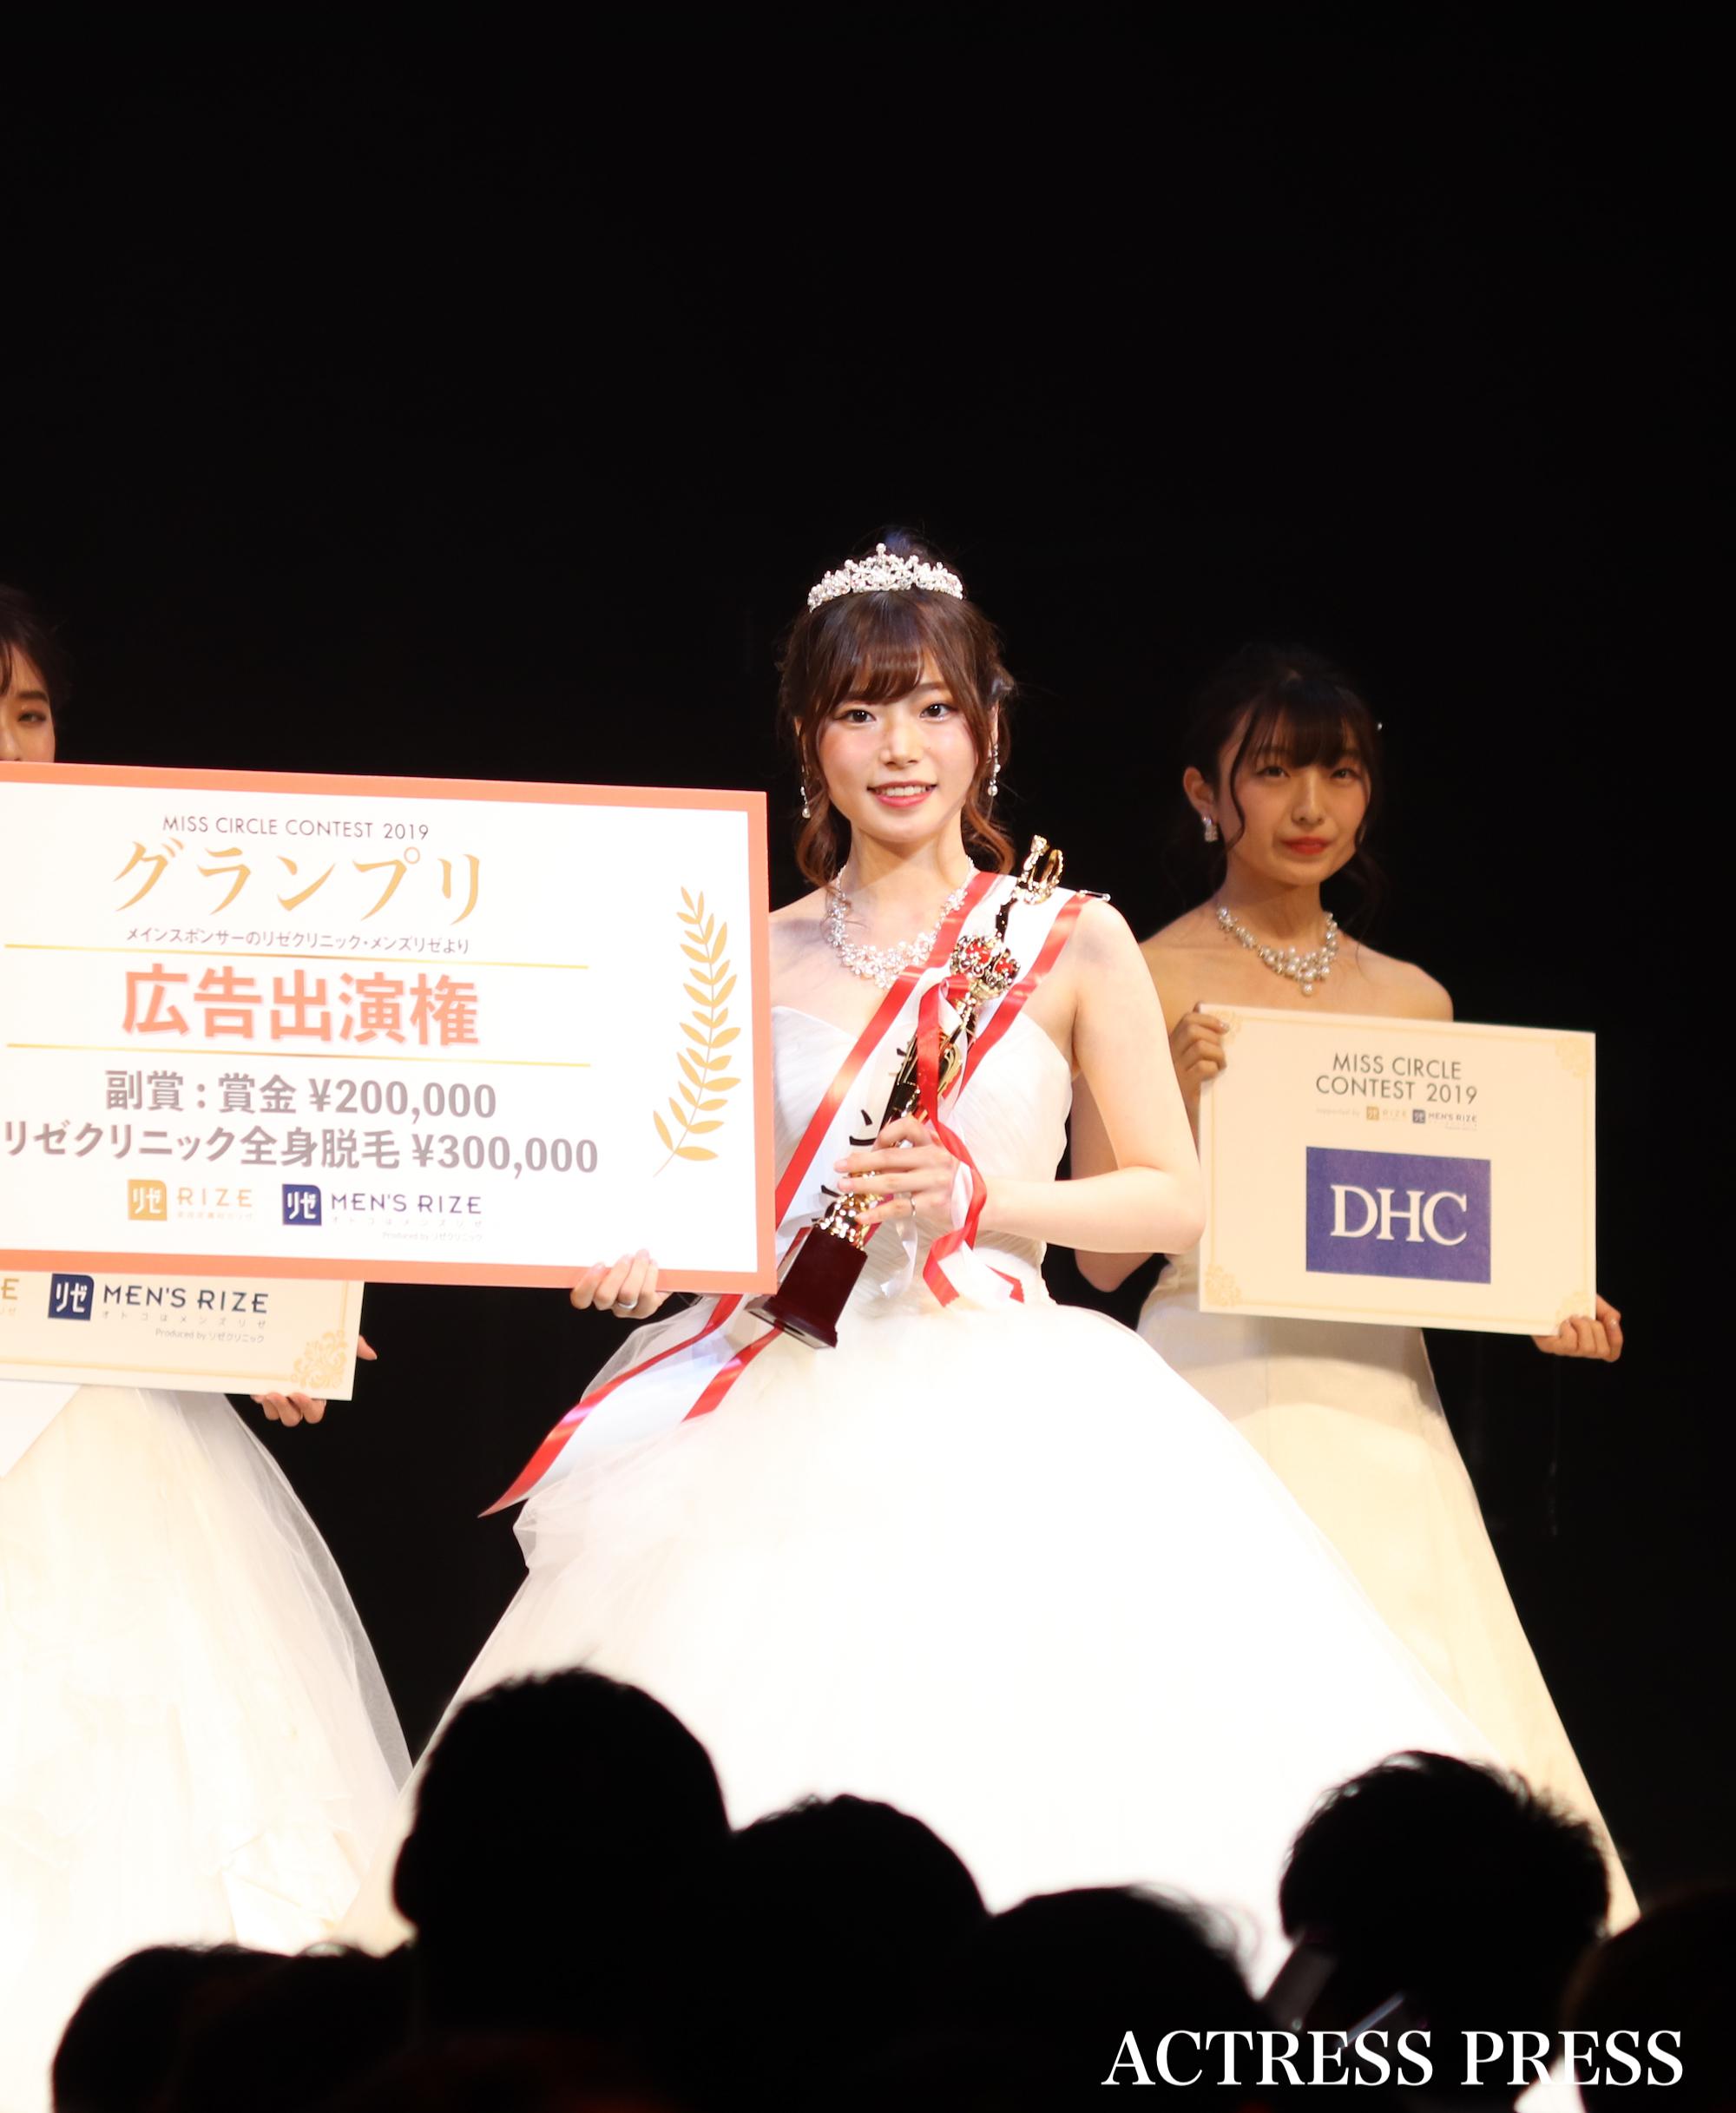 「MISS CIRCLE CONTEST 2019」(ミスサークルコンテスト)受賞者(グランプリ:黒川さくら(くろかわ・さくら)(C)ACTRESS PRESS編集部